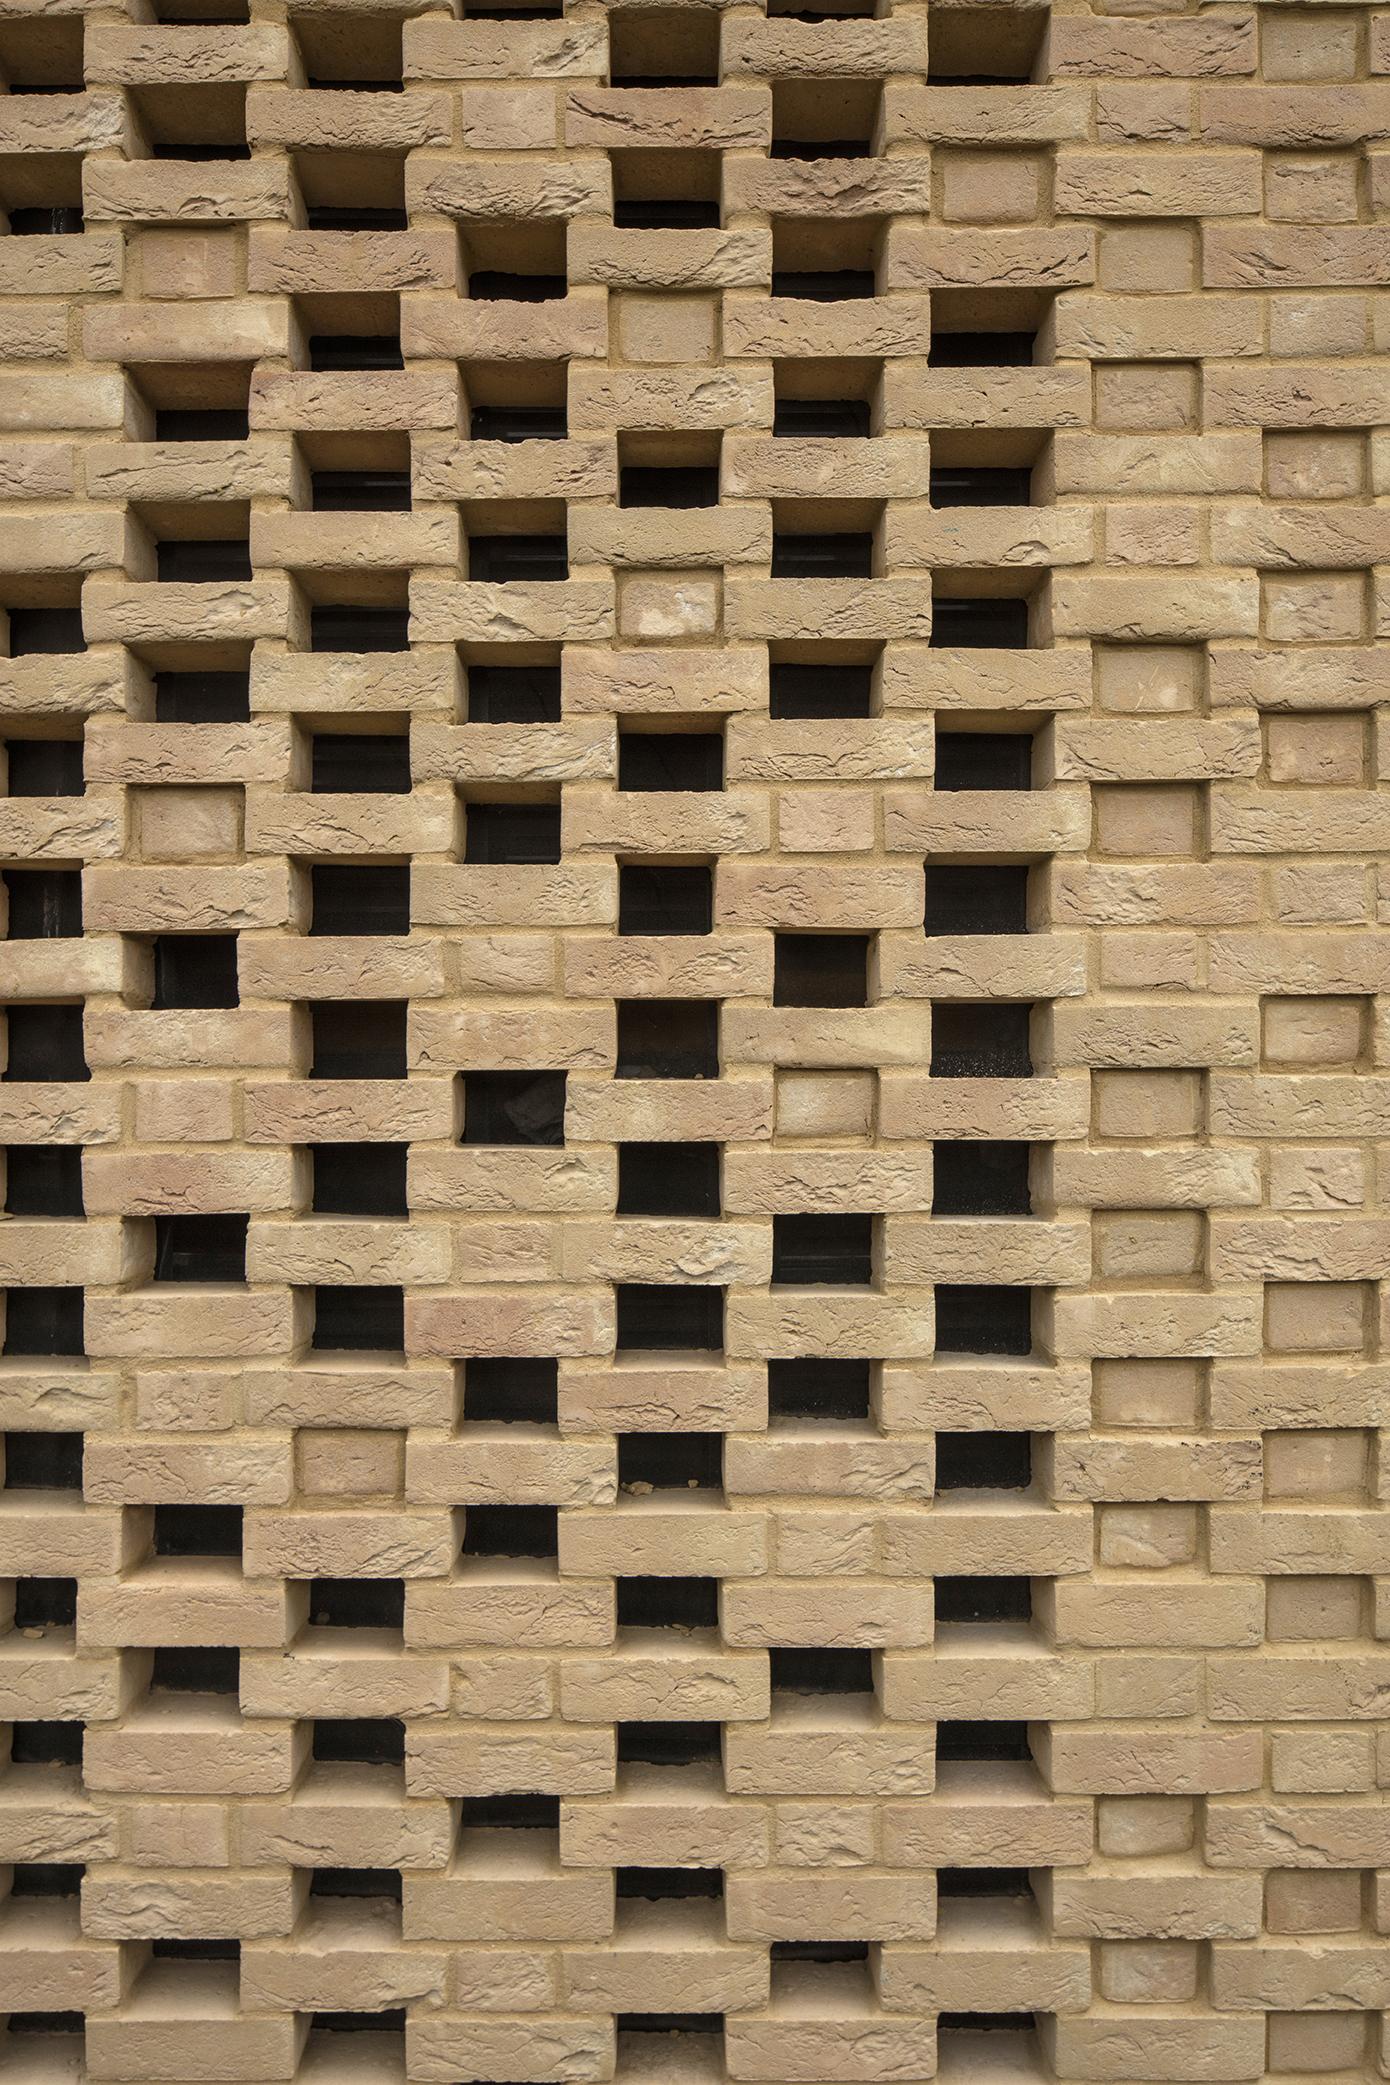 brickwork - University of Cambridge Primary School by Marks Barfield Architects